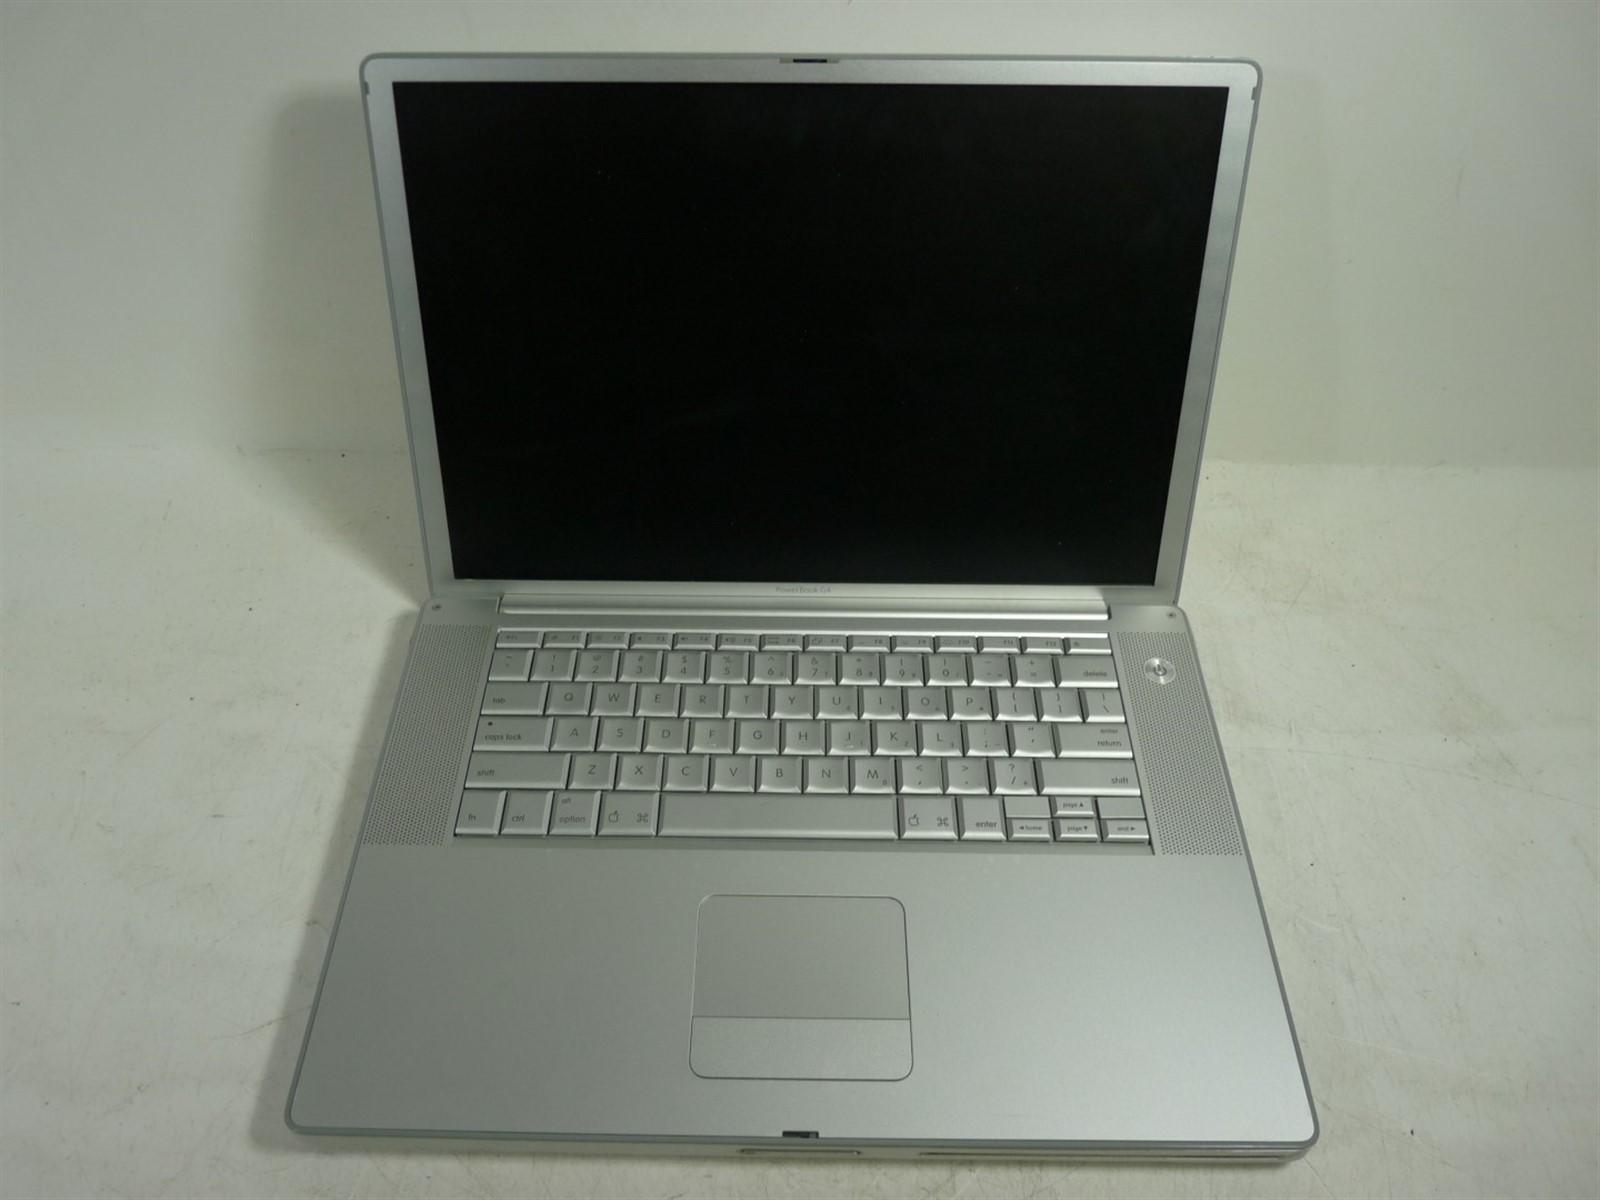 apple powerbook g4 a1106 laptop doesn t power on 0 ram 0 hd as is ebay rh ebay com MacBook Air powerbook g4 17 service manual